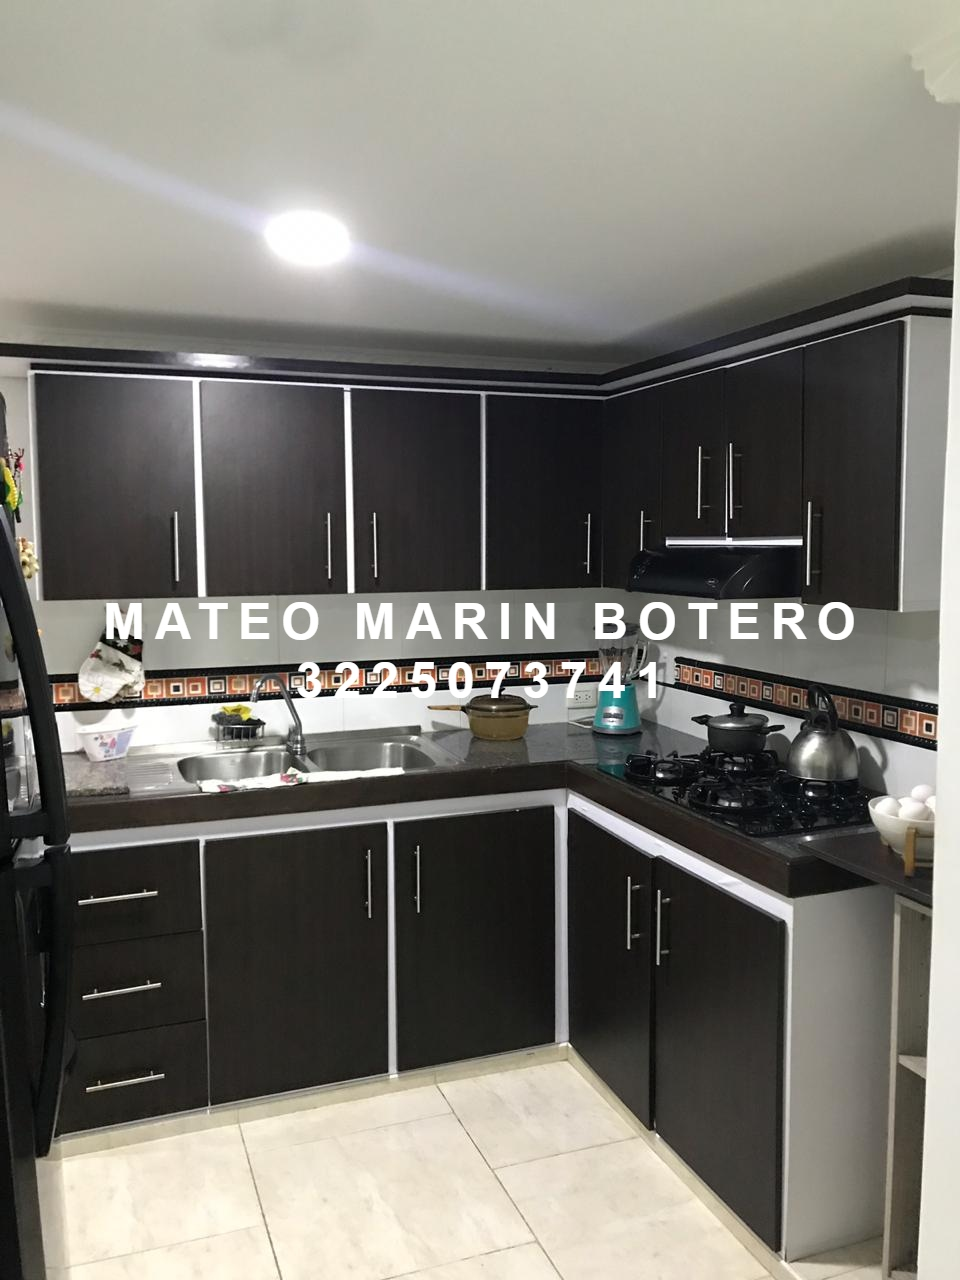 AV-0083 Se vende apartamento en Chinchiná, en sector residencial.